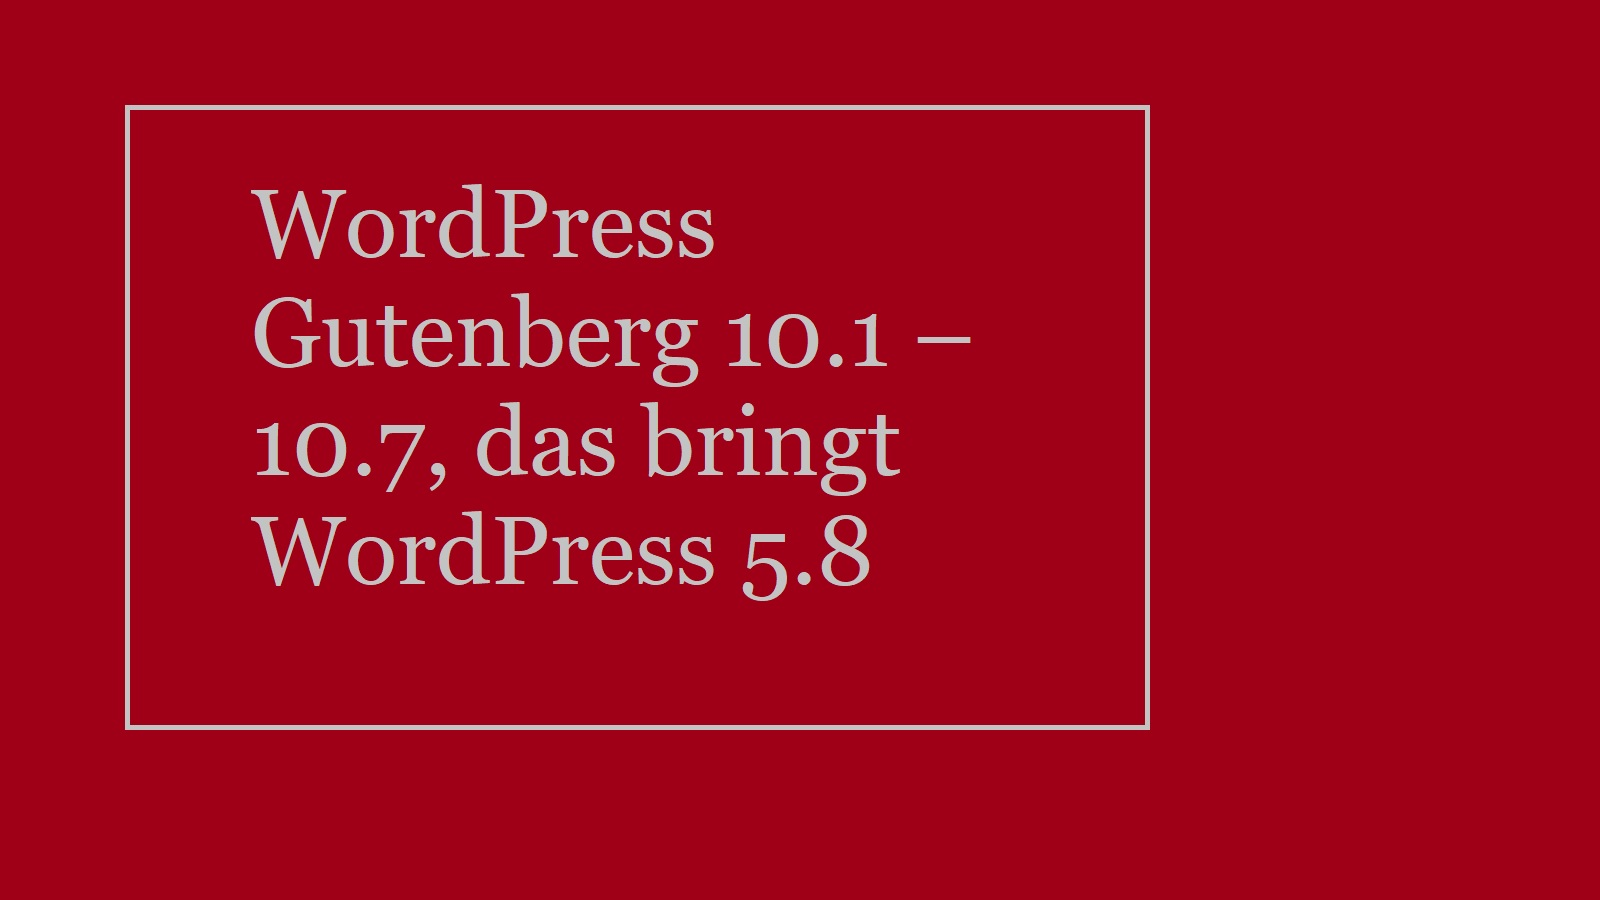 wordpress-gutenberg-10.1-10.7